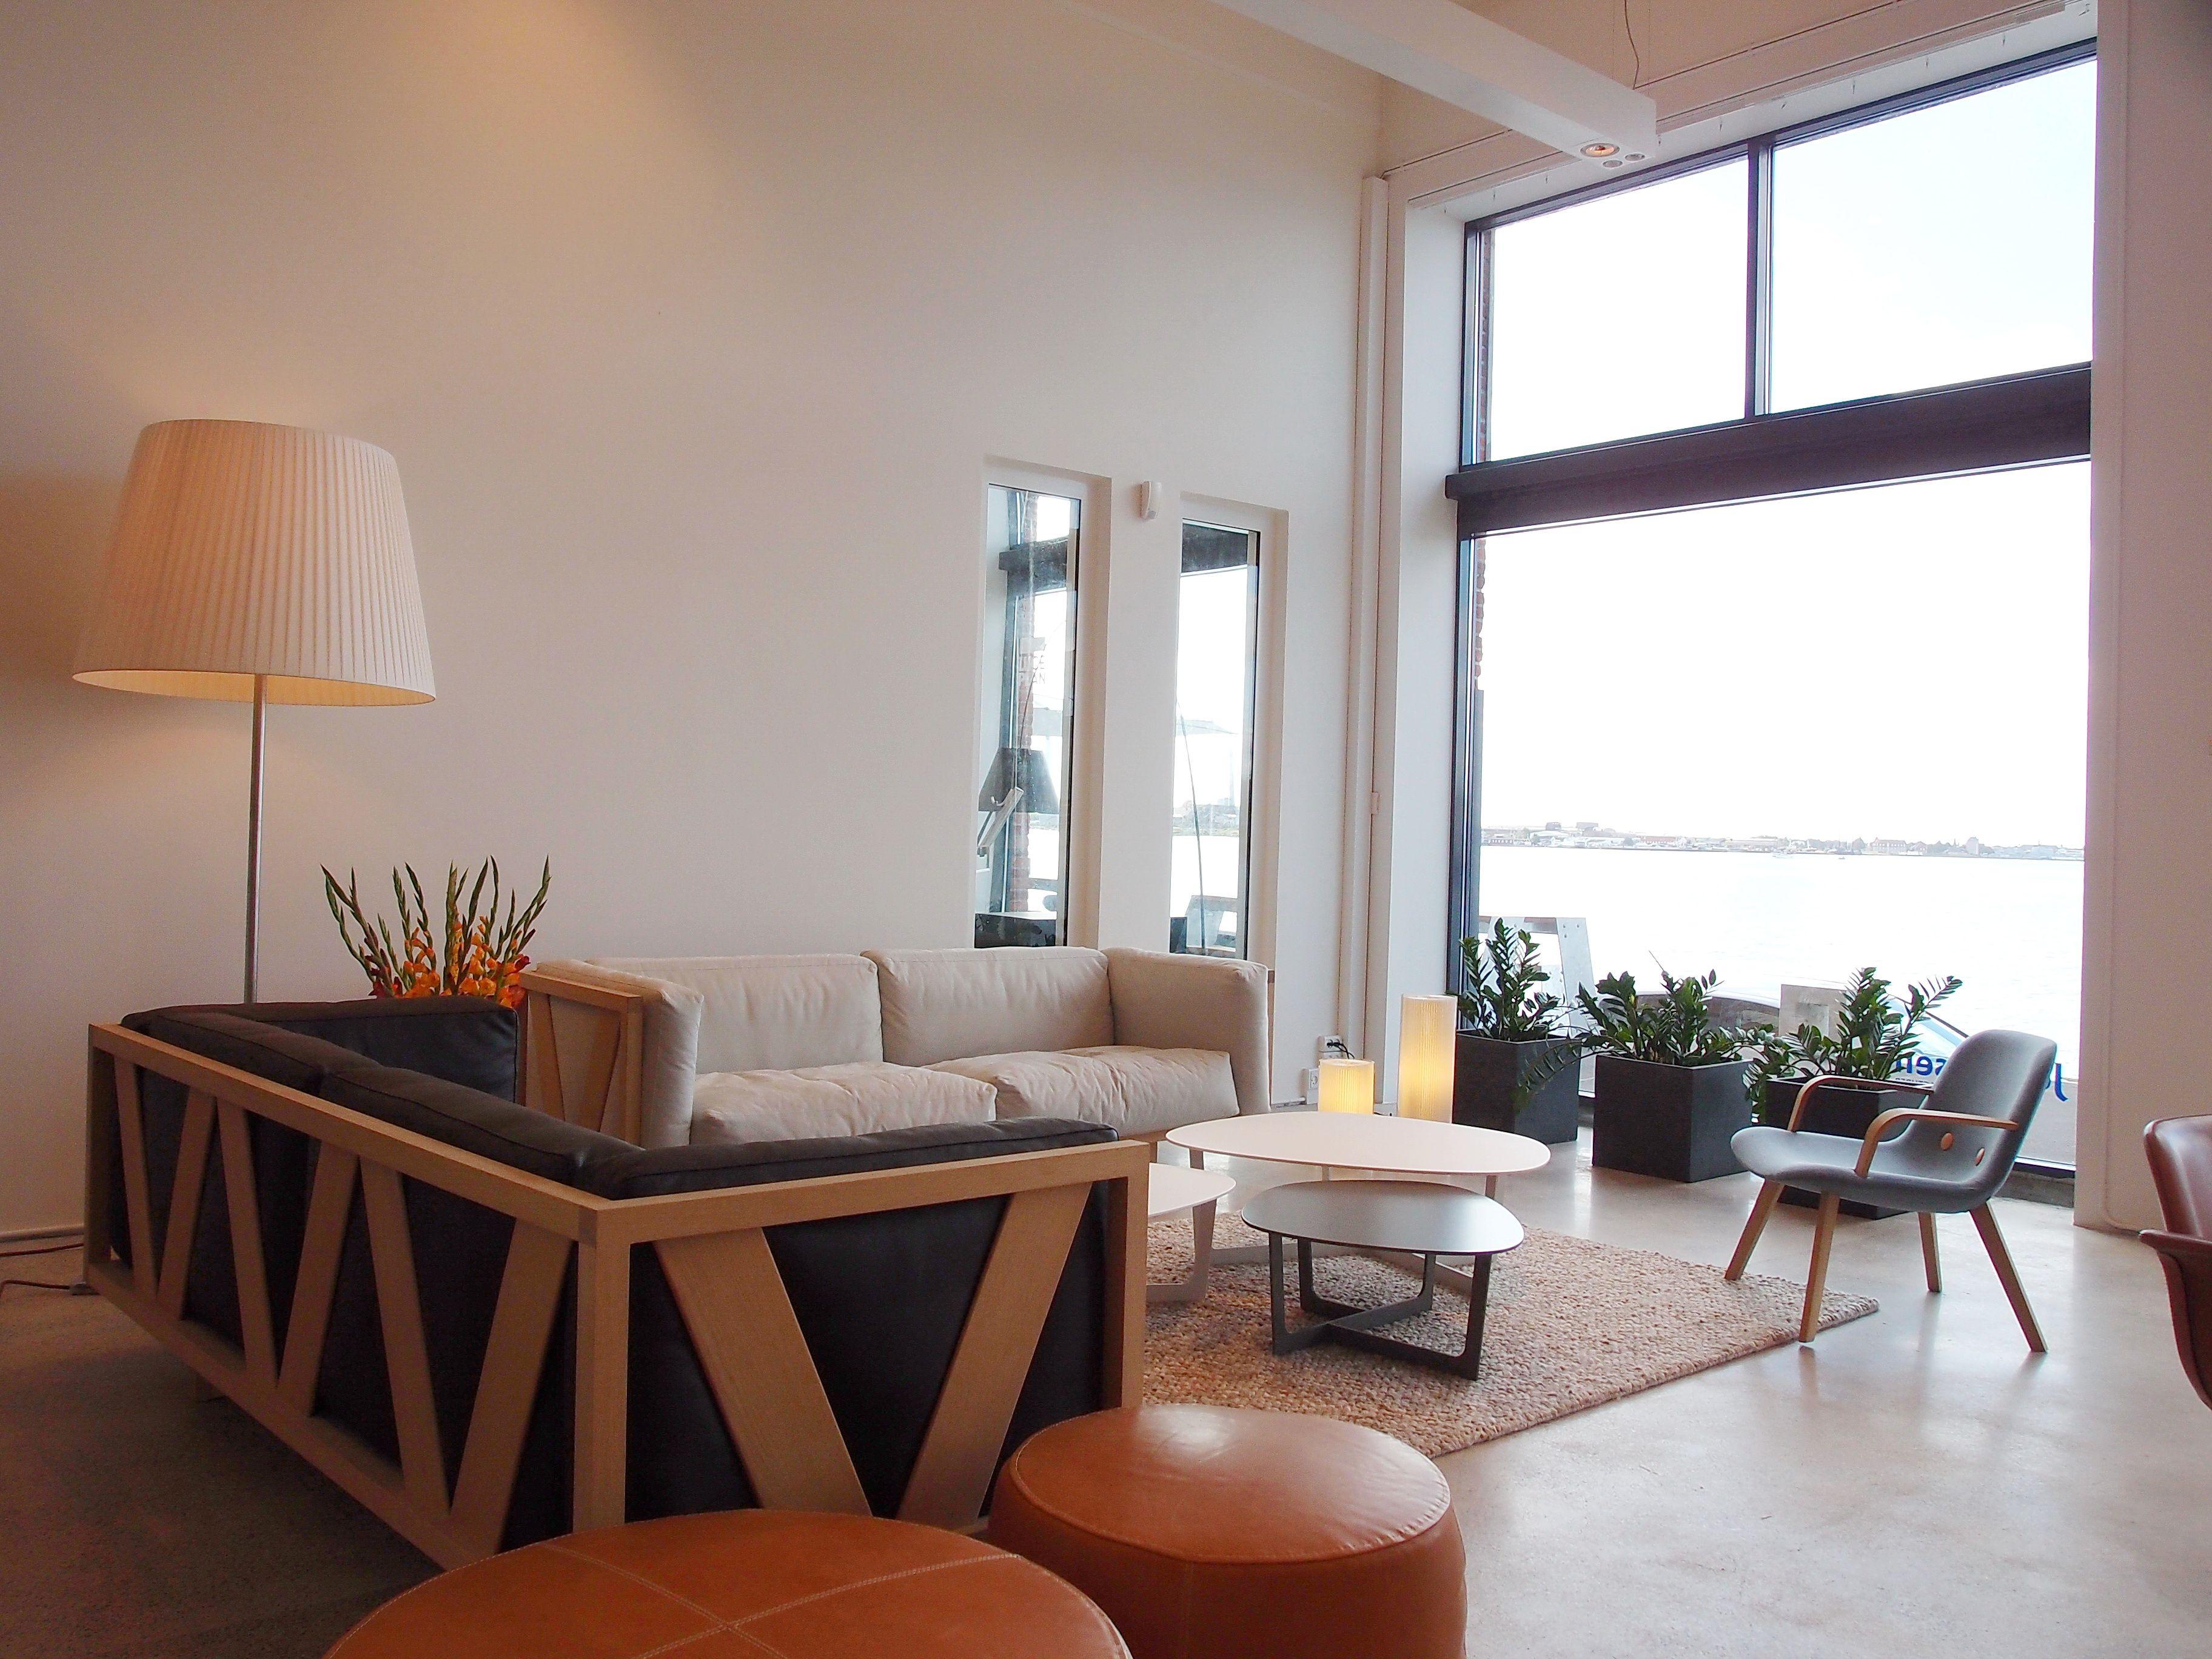 beyond furniture. Beautiful Display In A Scandinavian Furniture Showroom At Pakhus 48. Beyond The Windows Is R